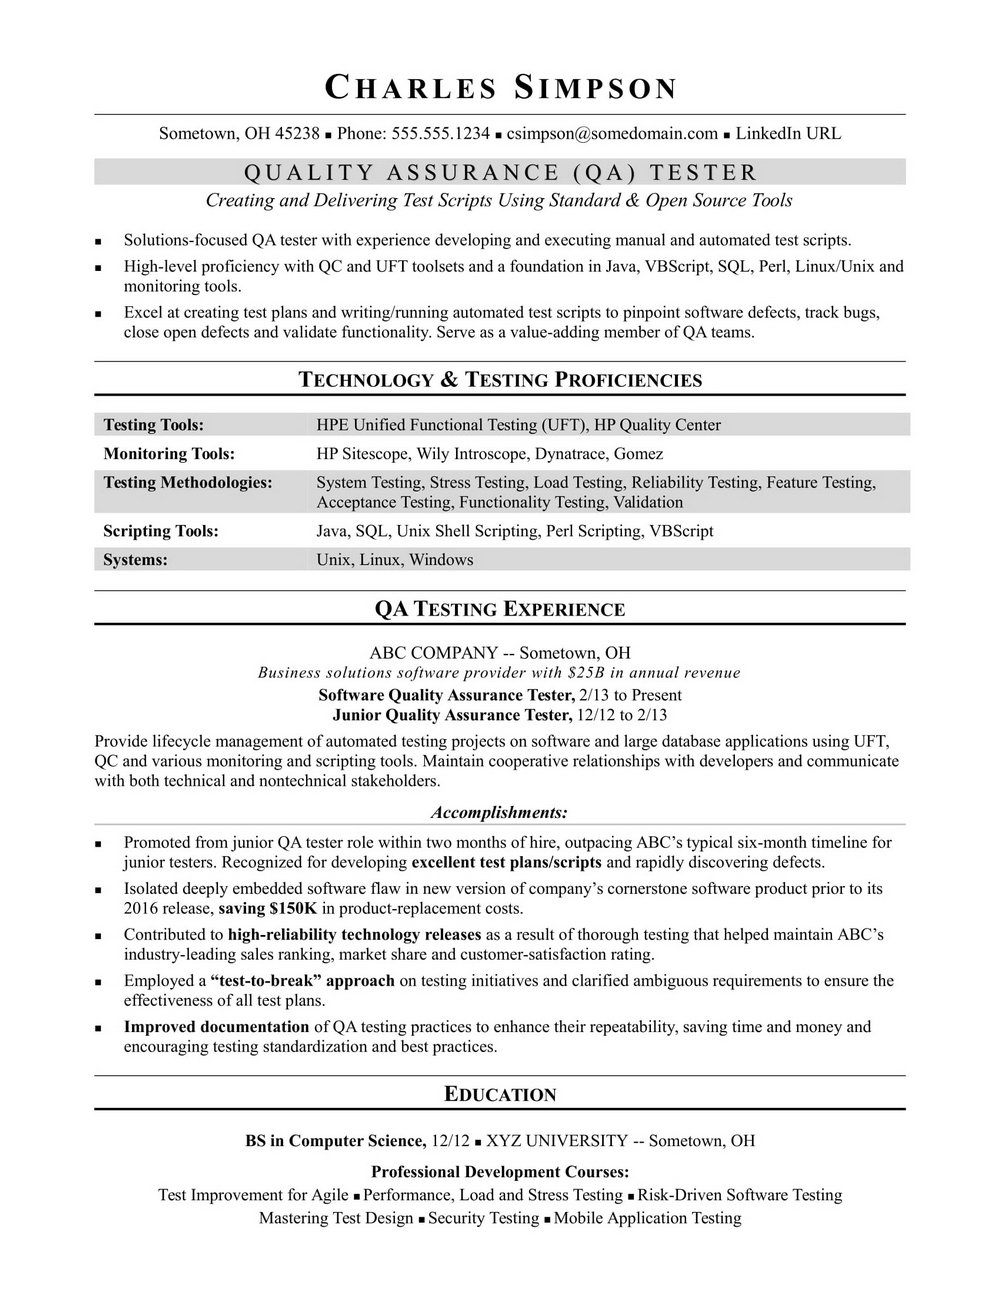 Qa Software Tester Resume